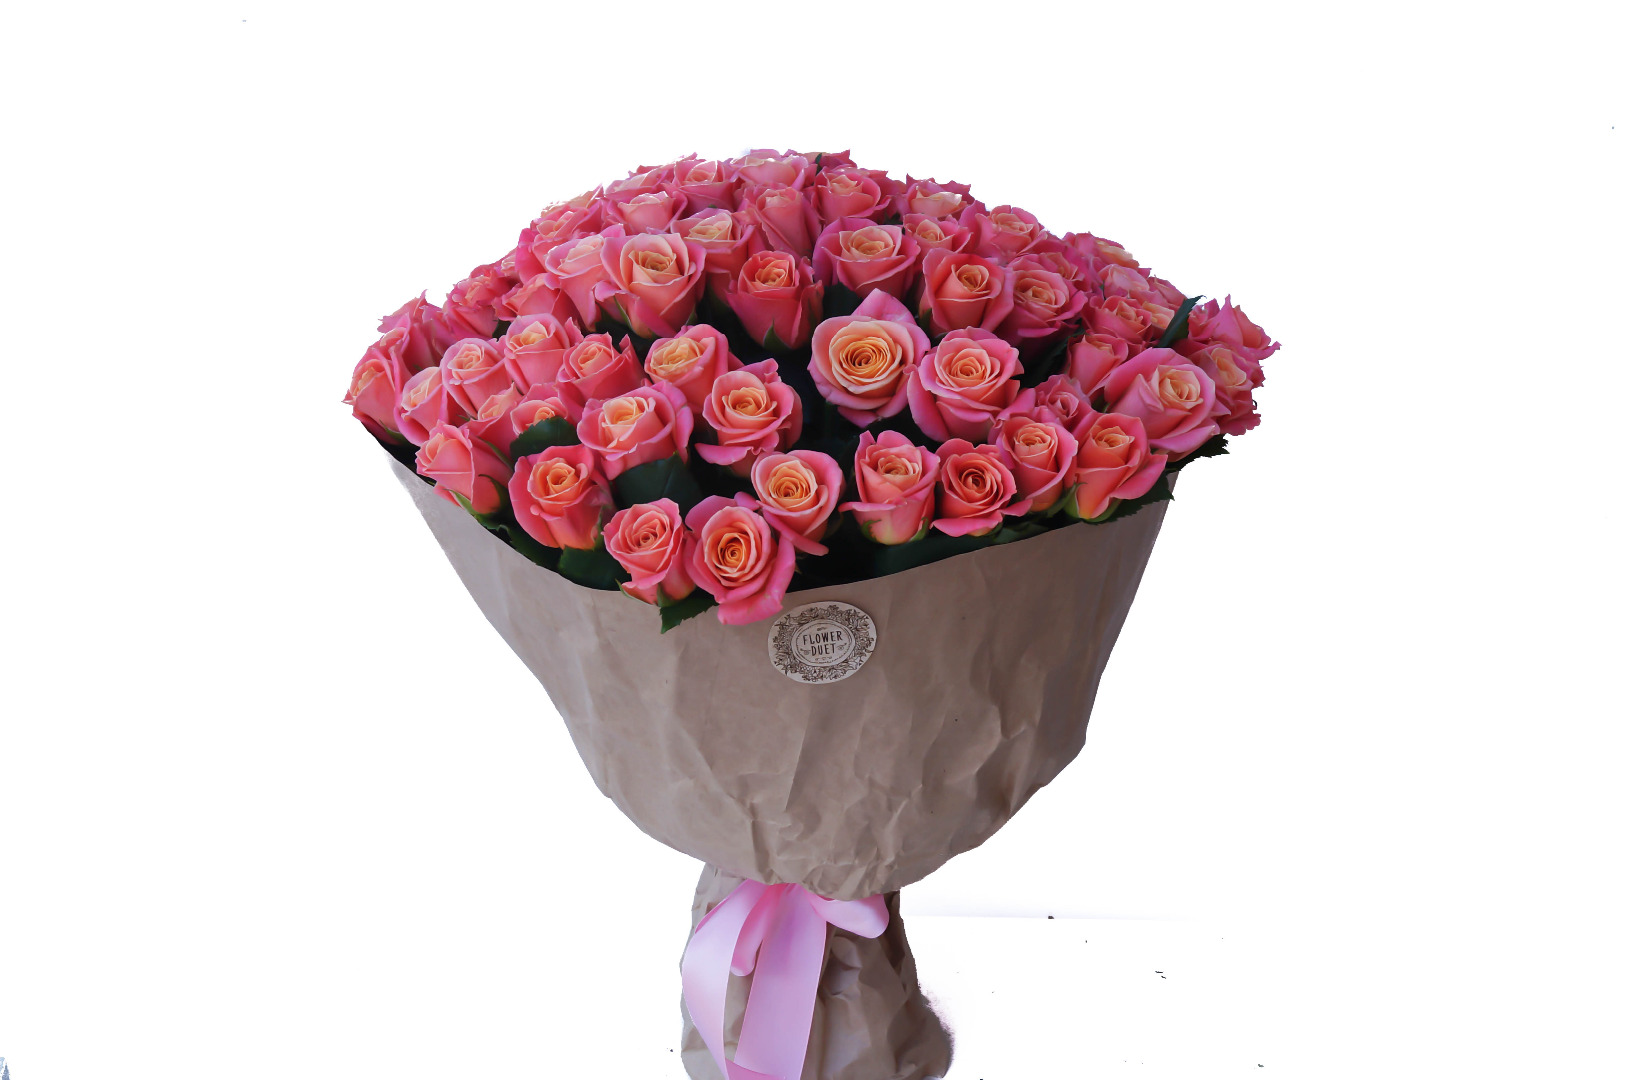 101 роза в челябинске, доставка цветов чита